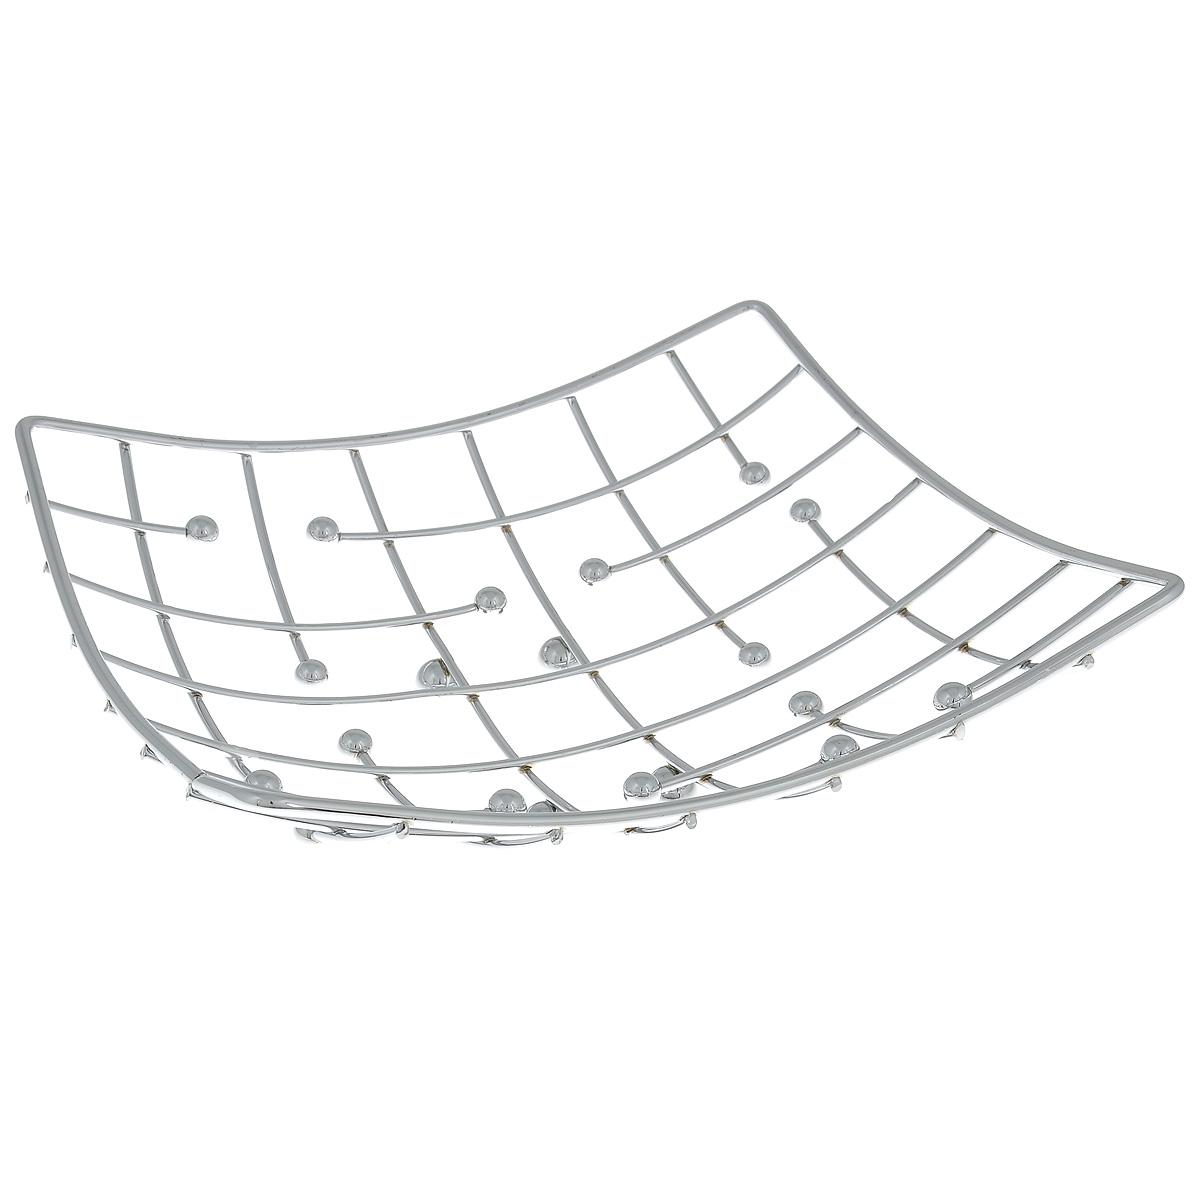 Фруктовница Kesper, 27 см х 24 см корзина kesper 29 х 23 х 8 см